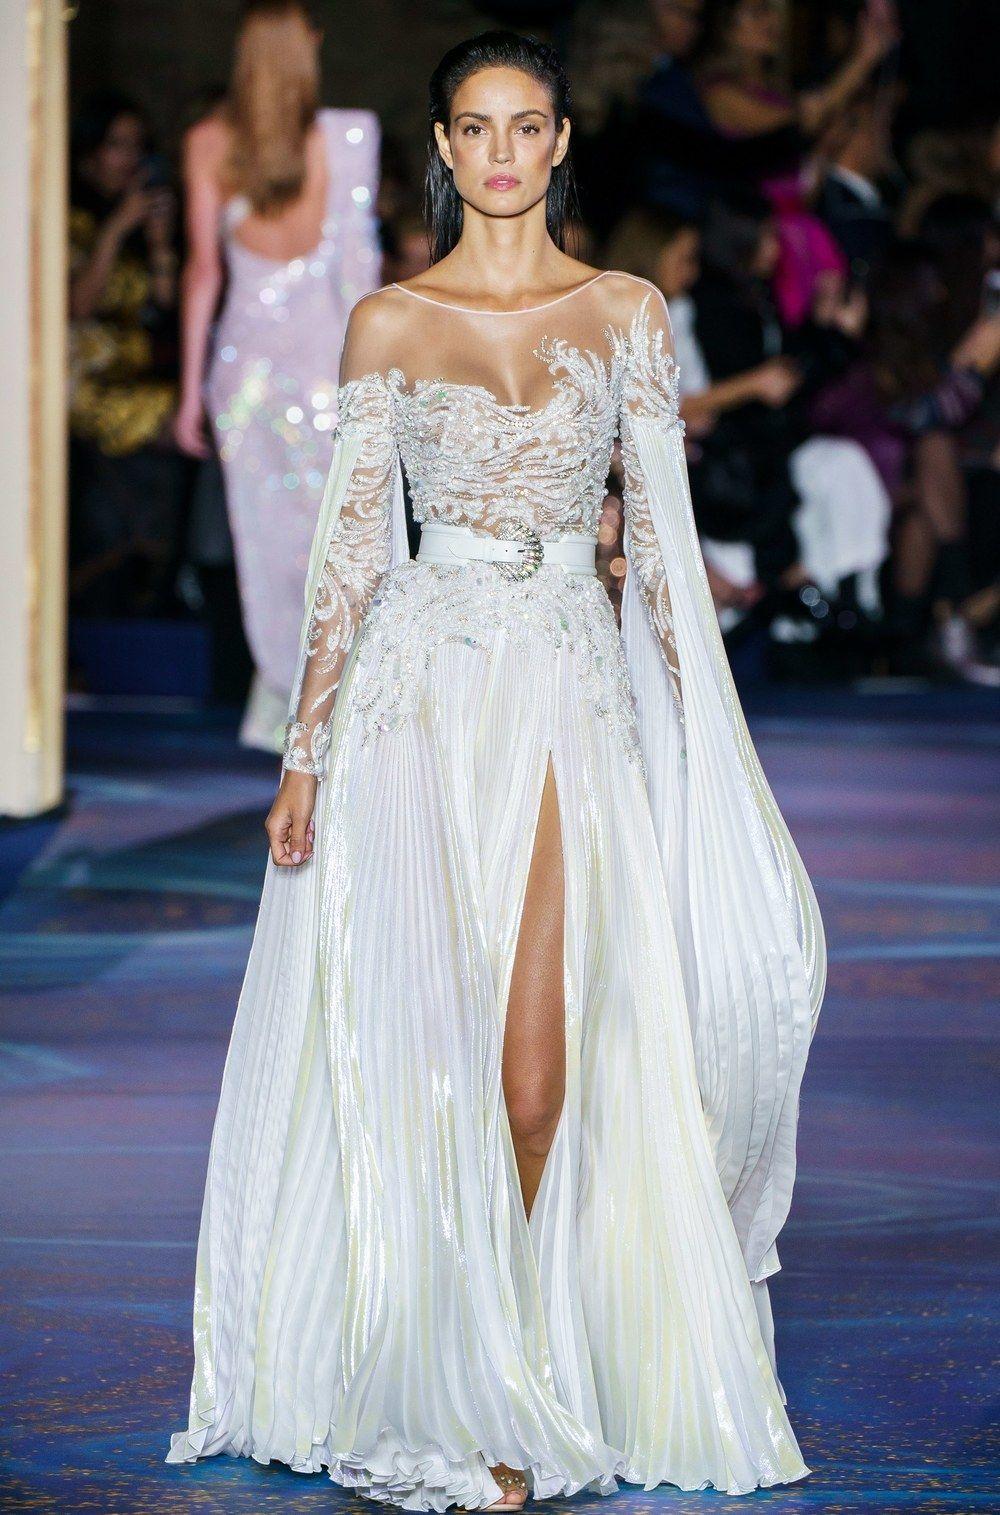 Zuhair Murad Frühjahr/Sommer 2019 Haute Couture - Kollektion | Vogue Germany #gorgeousgowns